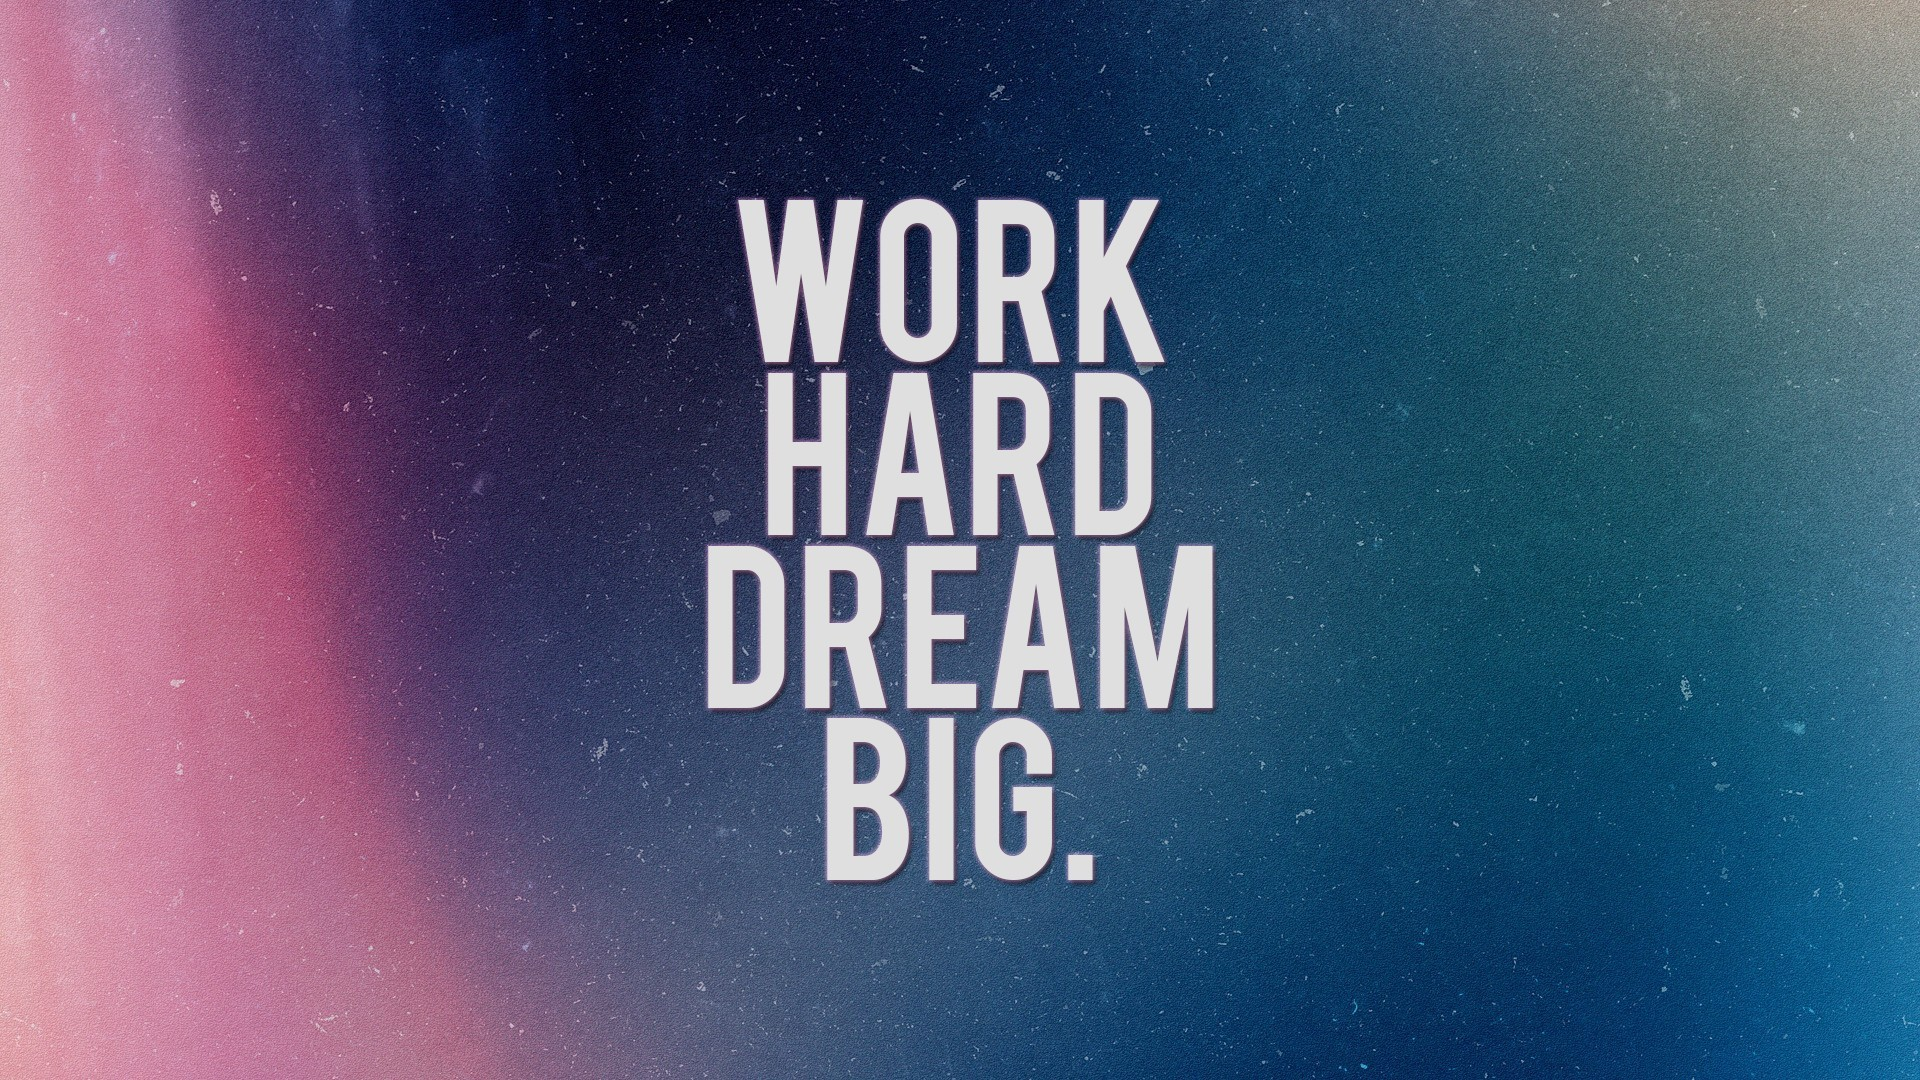 Work hard dream big Wallpaper 2618 1920x1080